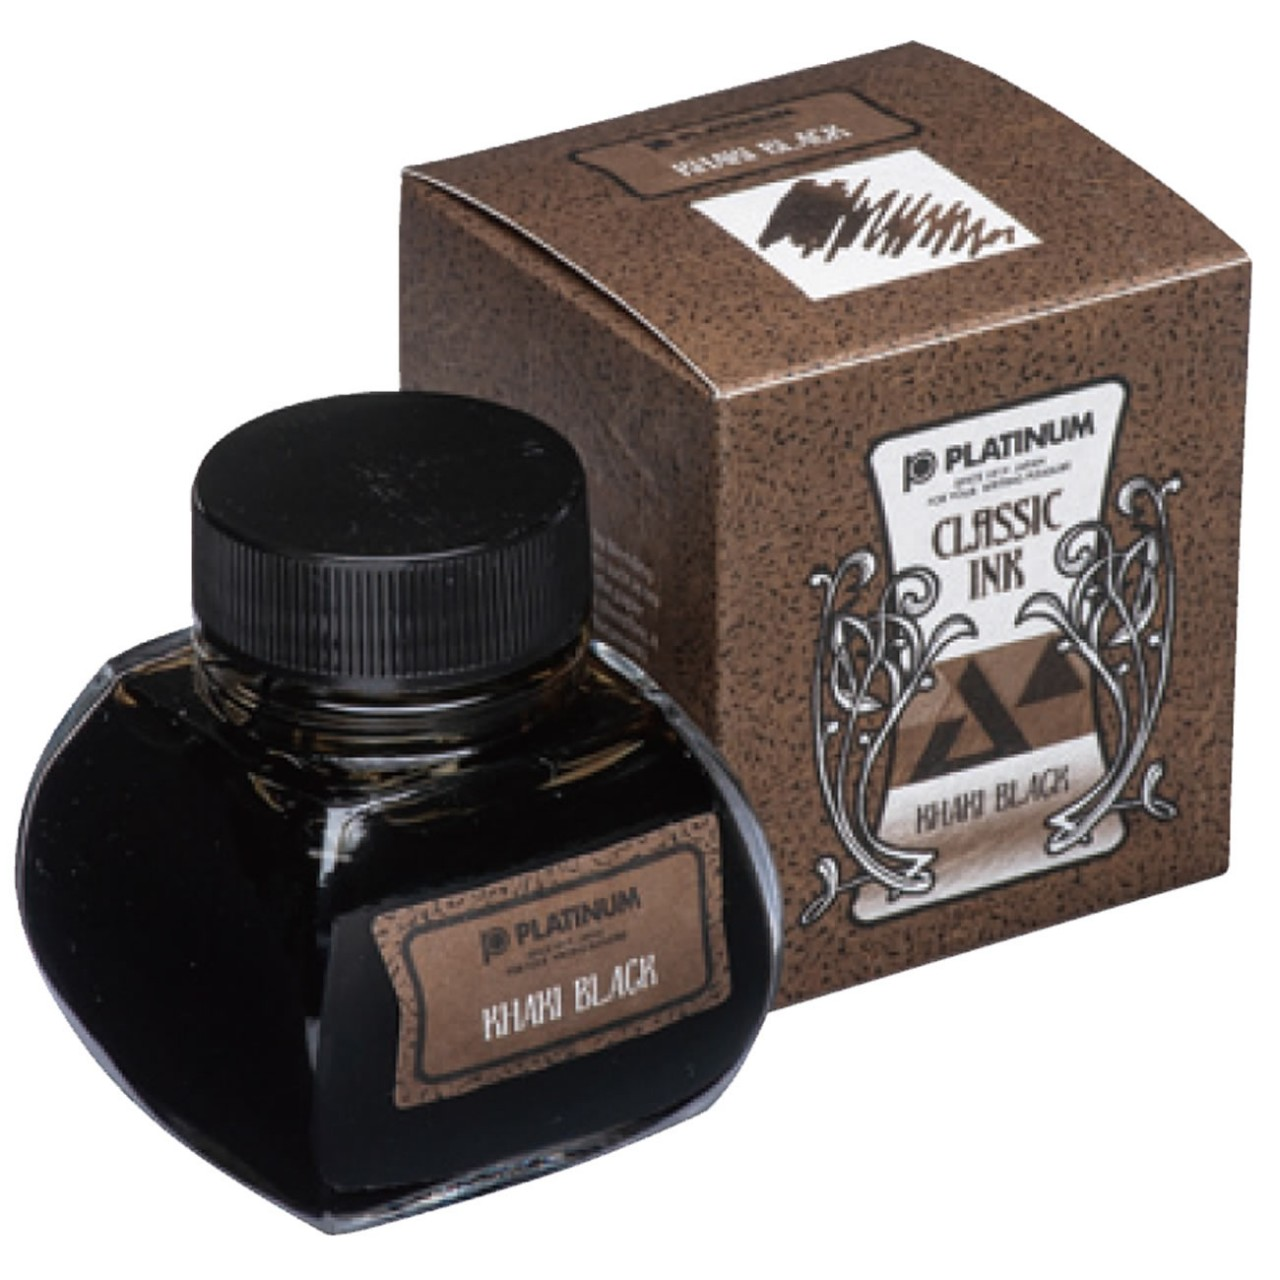 Platinum Dyestuff 'Classic Ink' Khaki Black